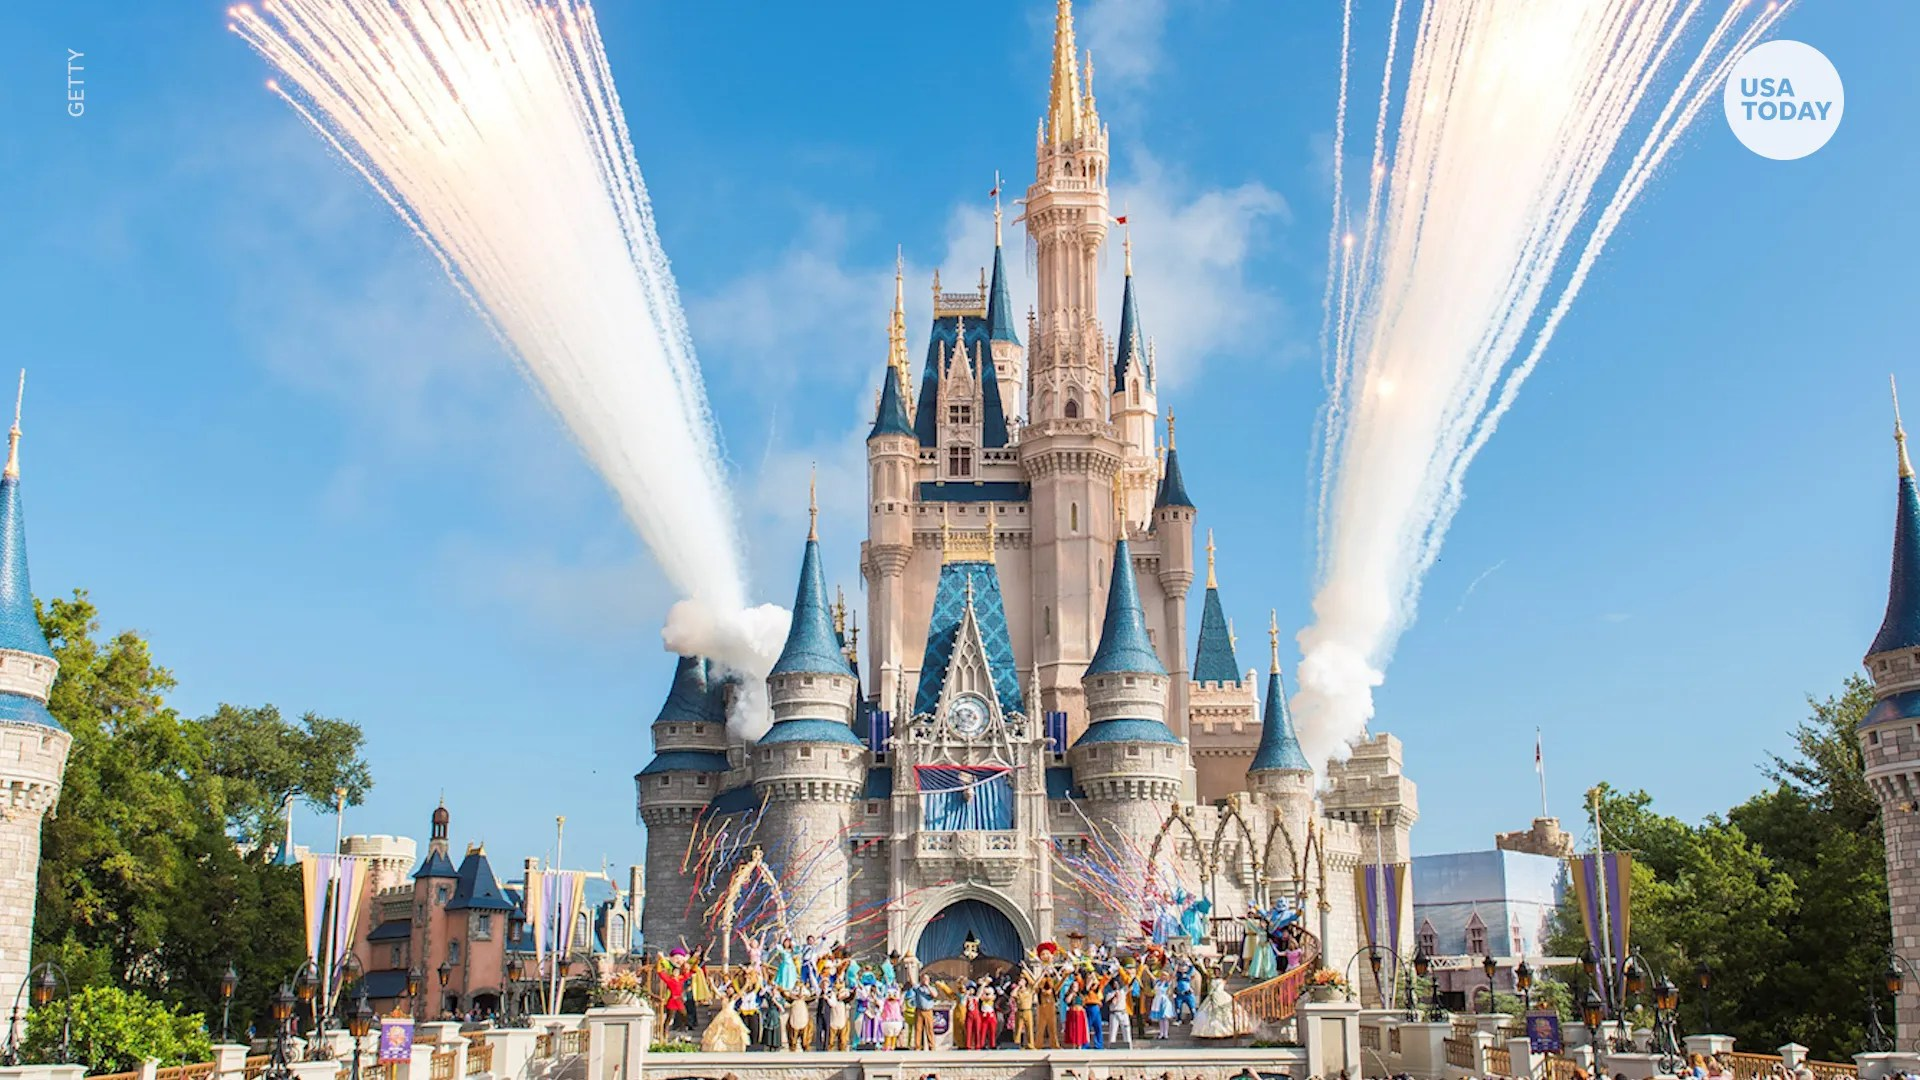 Coronavirus cancellations: Sea World, Disney World, more shut down